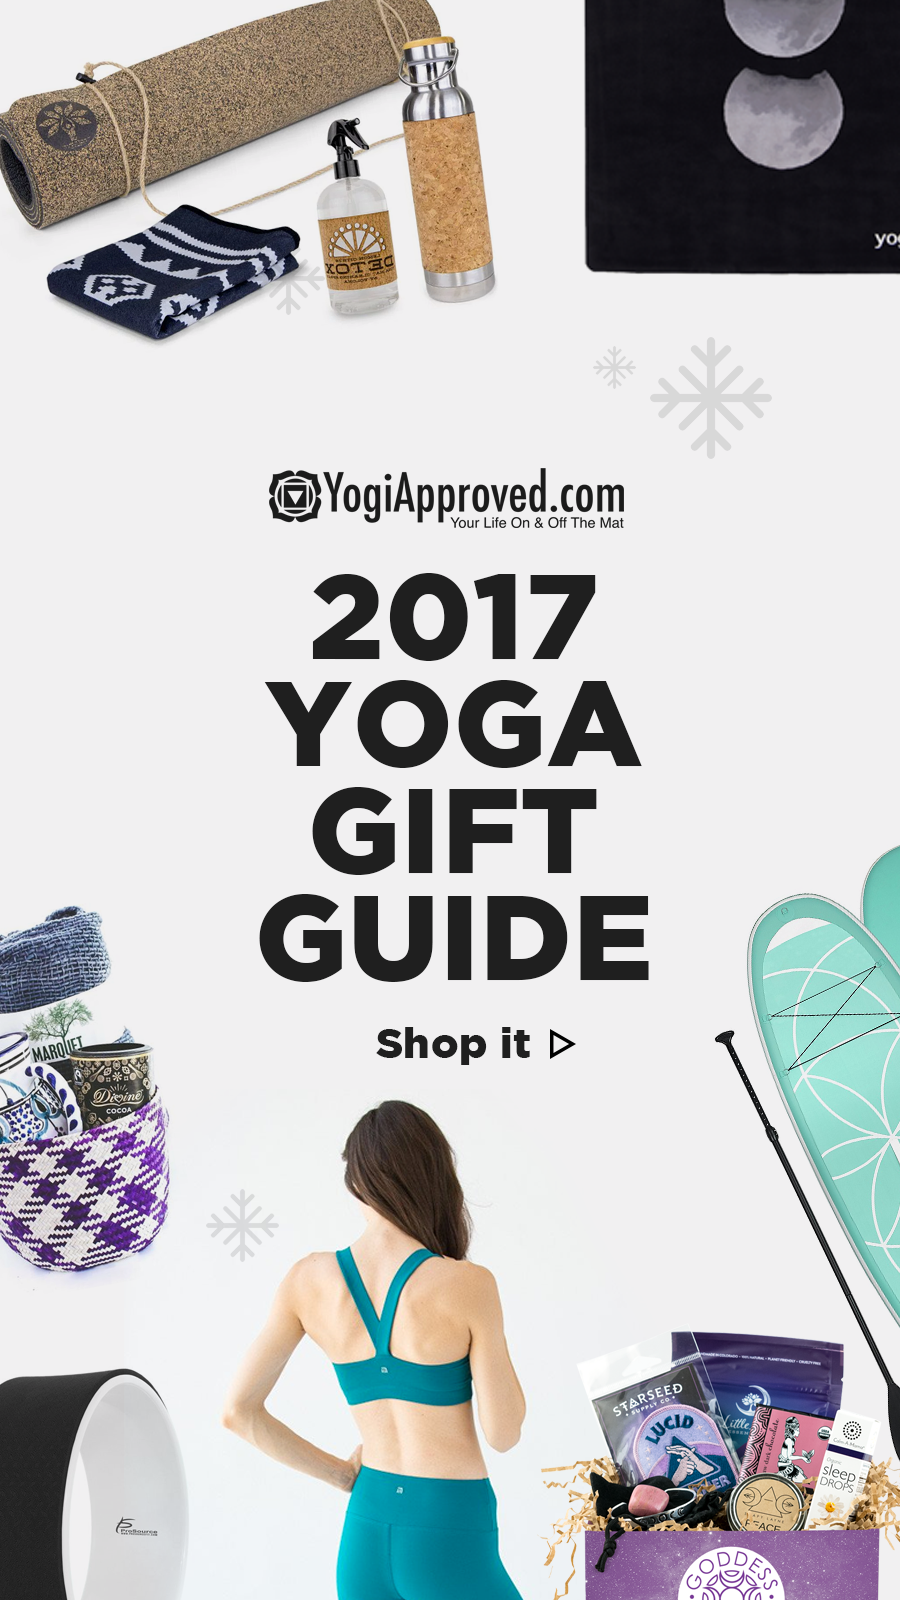 yoga gift guide 2017 dealssite co